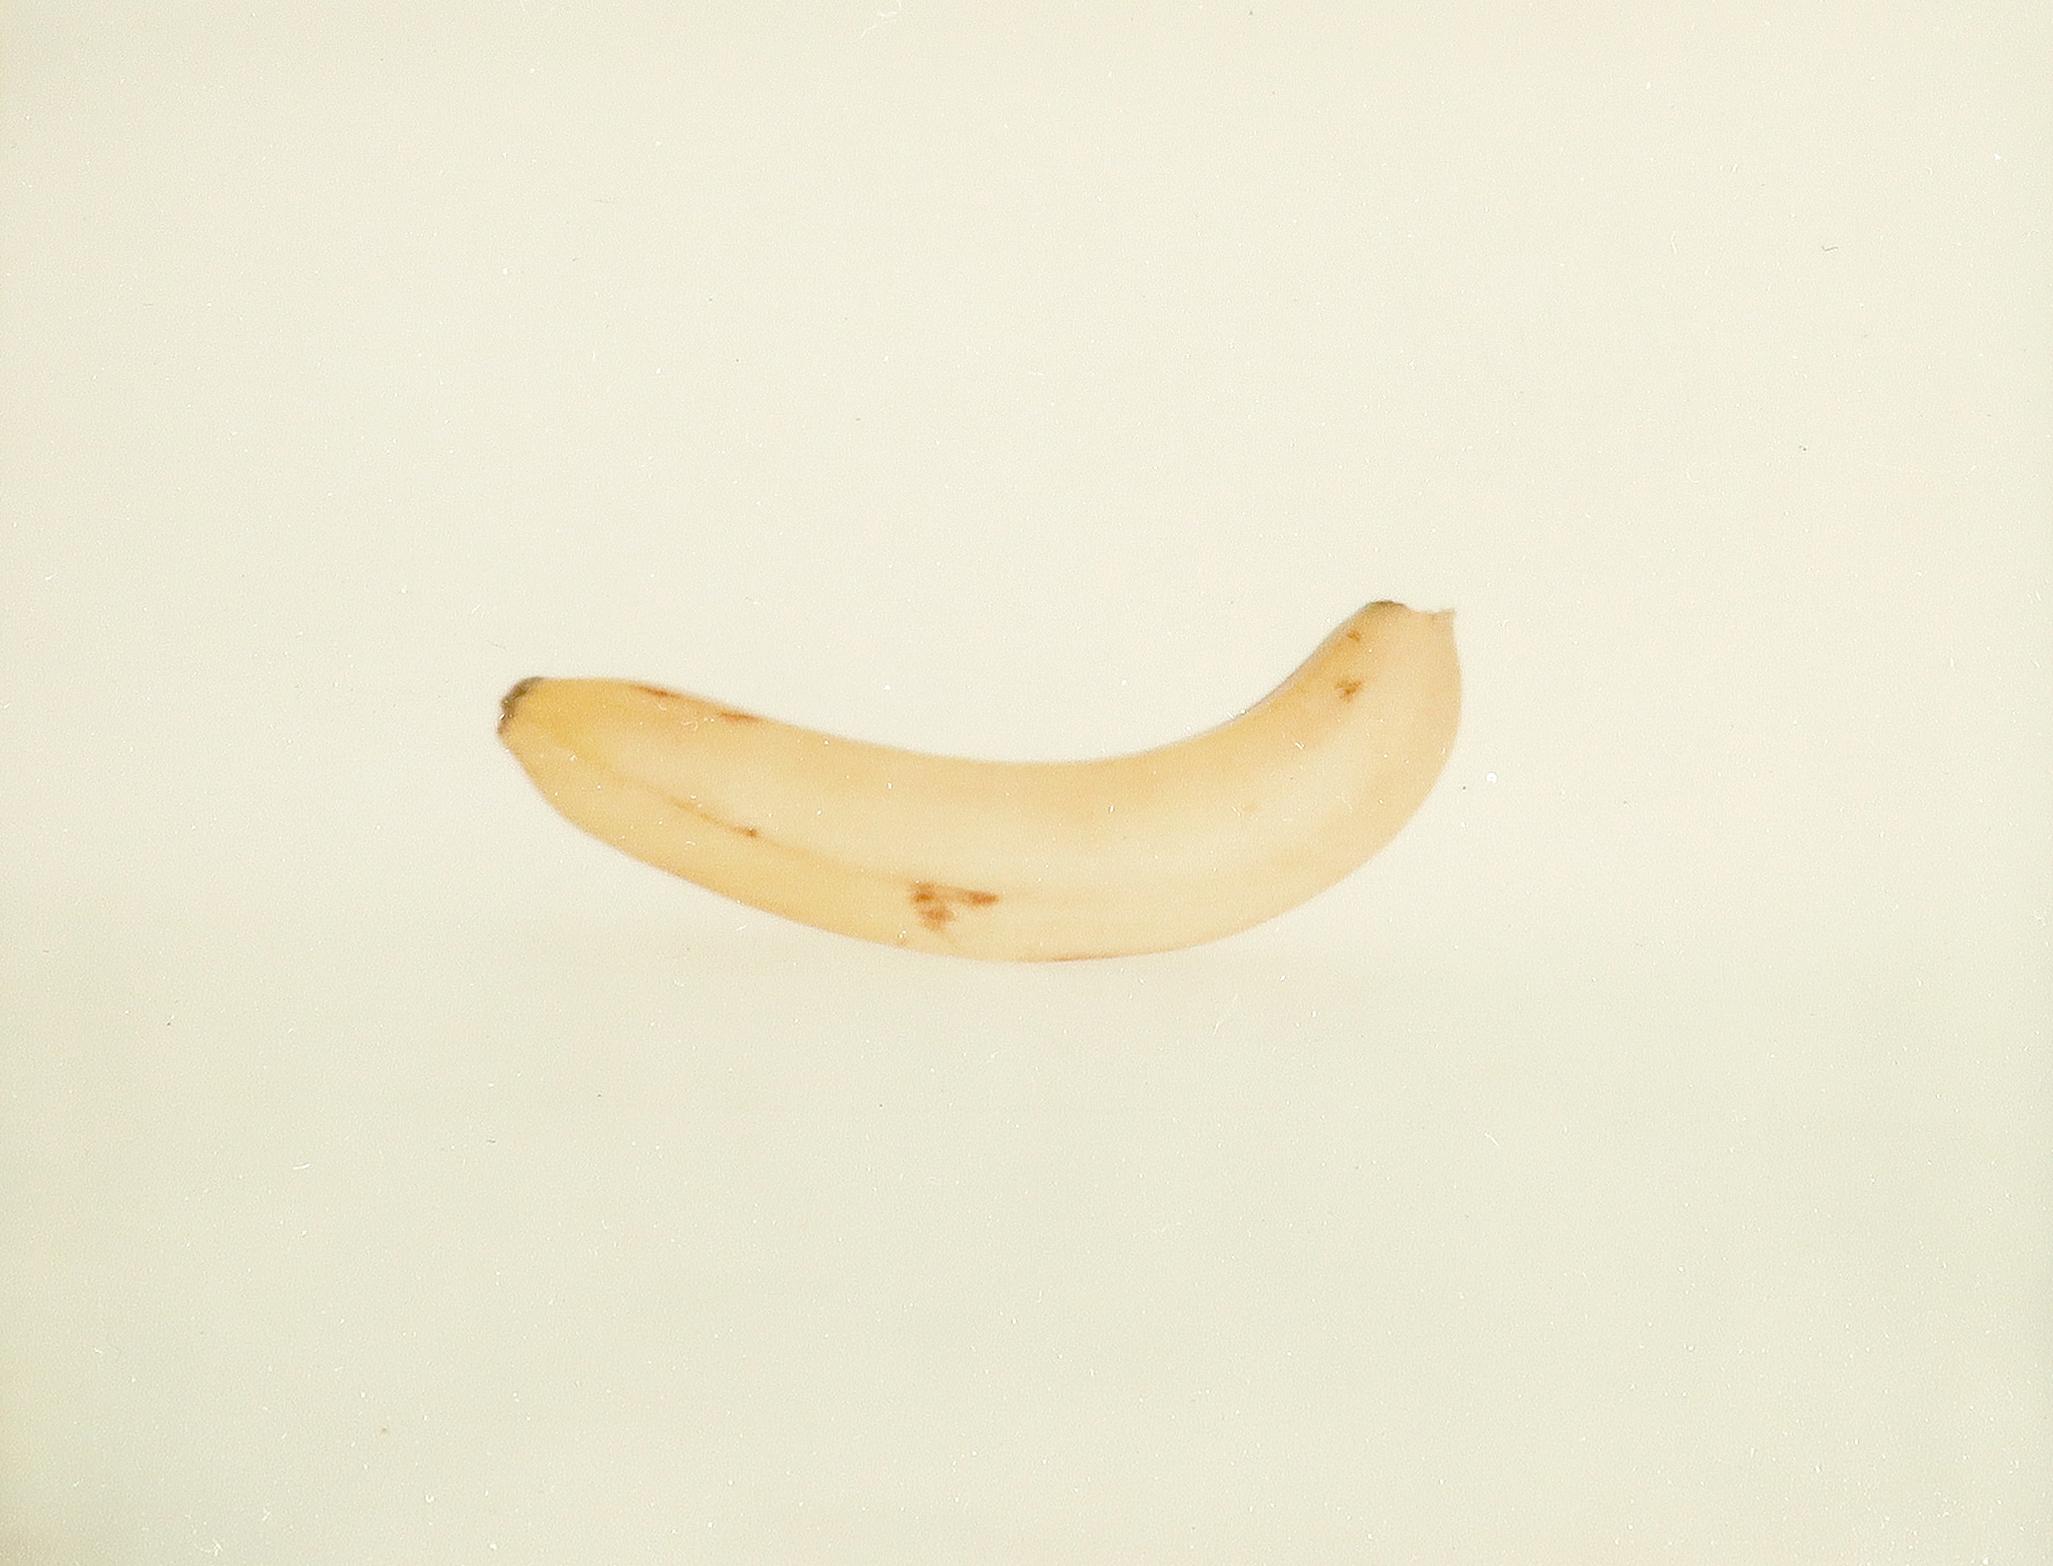 Andy Warhol (American 1928-1987) Banana Polaroid photograph, no. FA09.01849, 1977-78 8.2 x 10.5cm